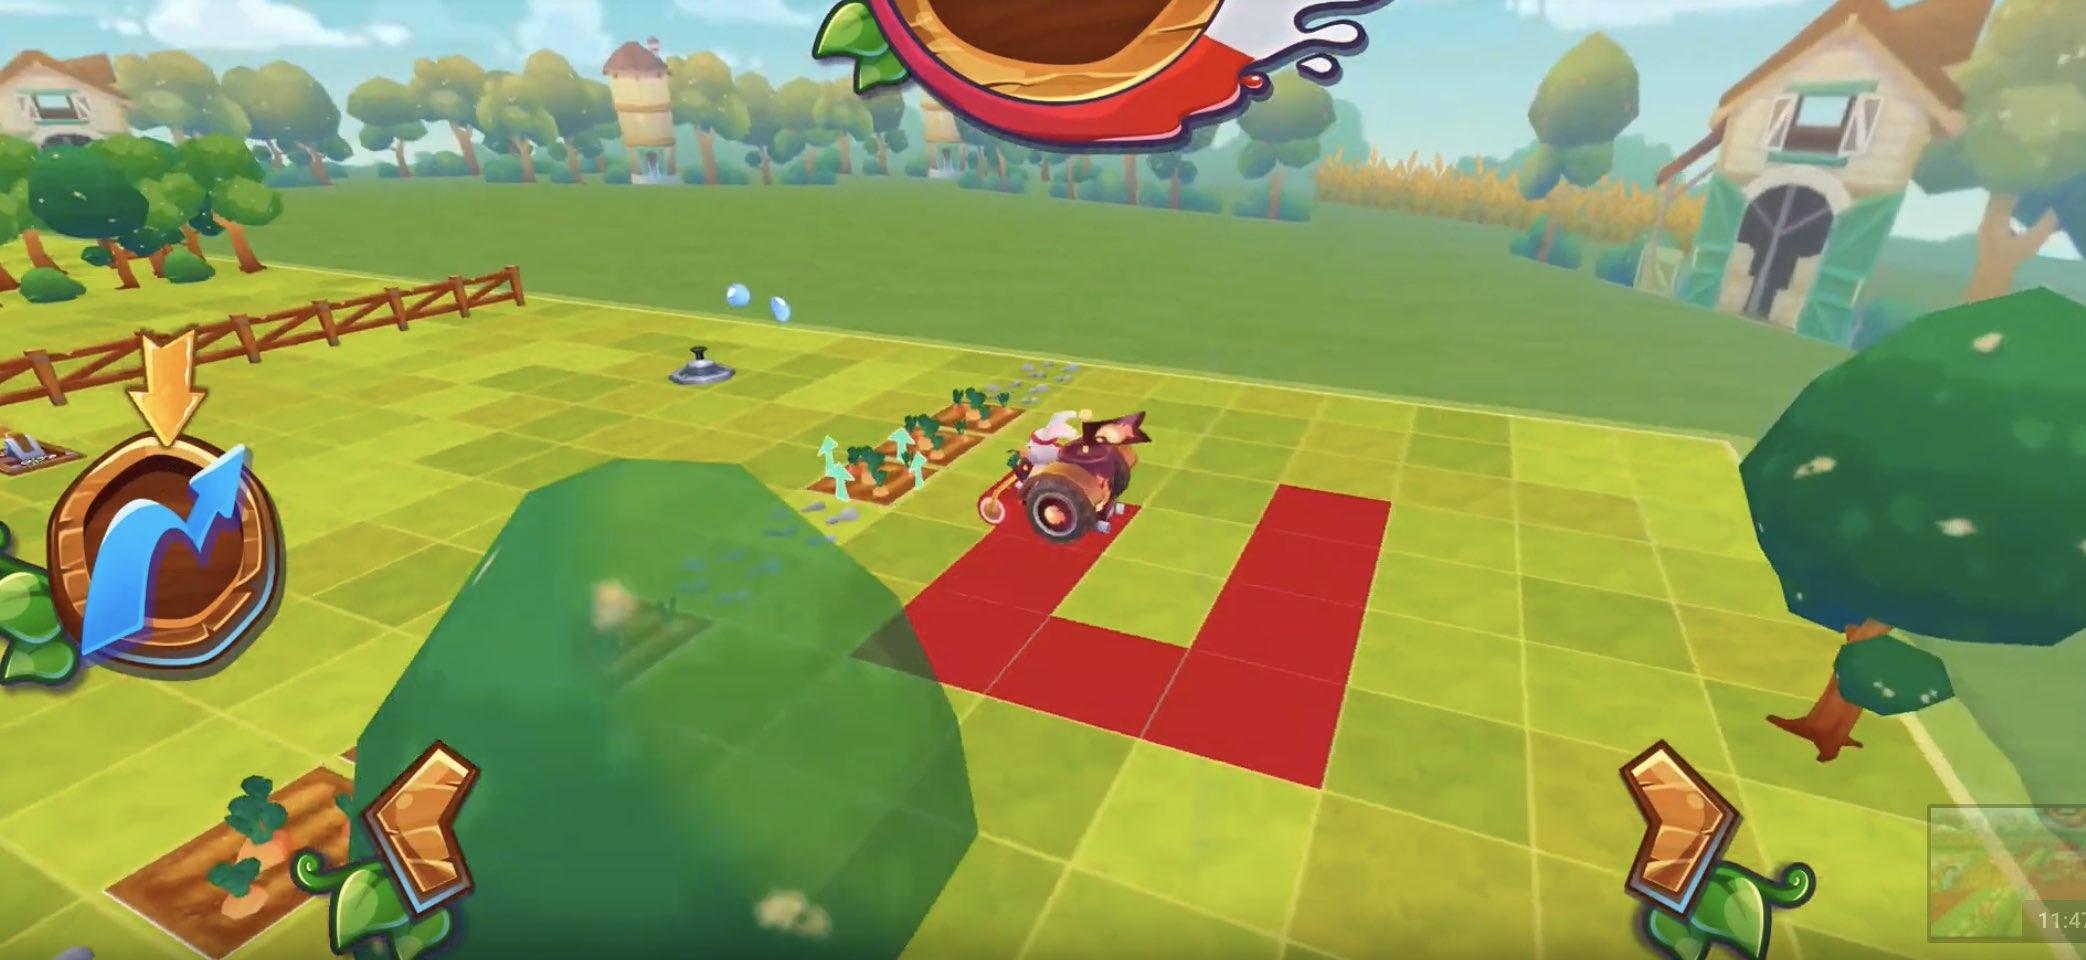 Splash Rabbit Arena wiki